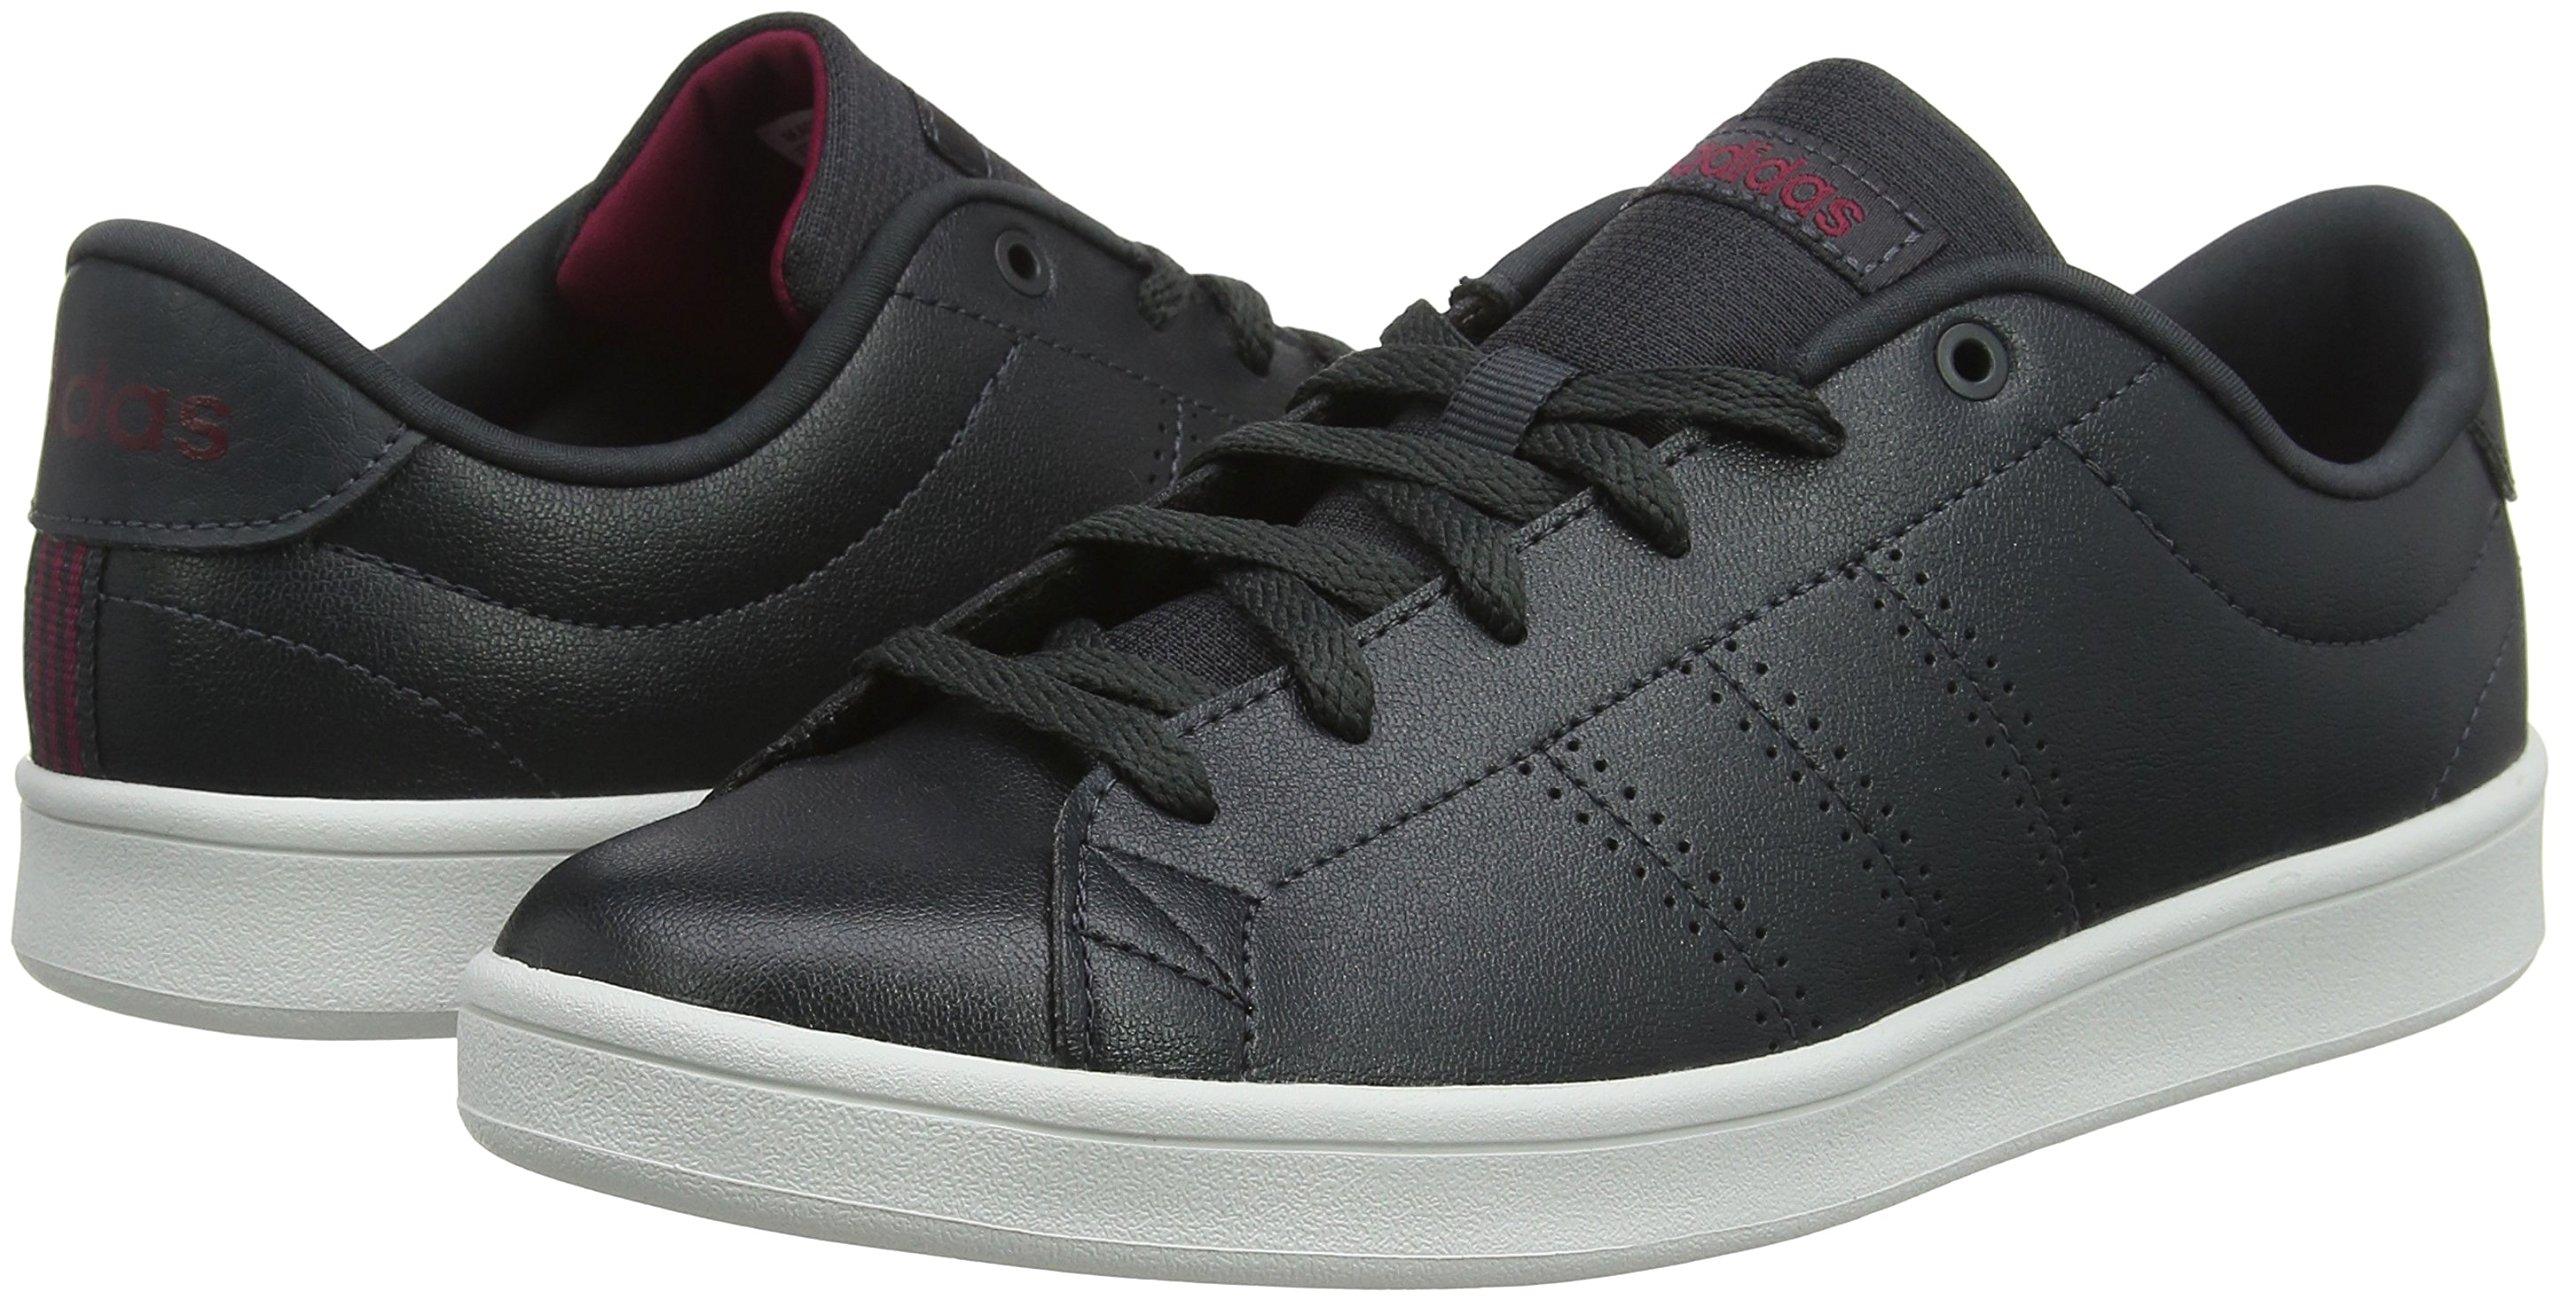 adidas Advantage Cl QT, Scarpe da Tennis Donna 5 spesavip